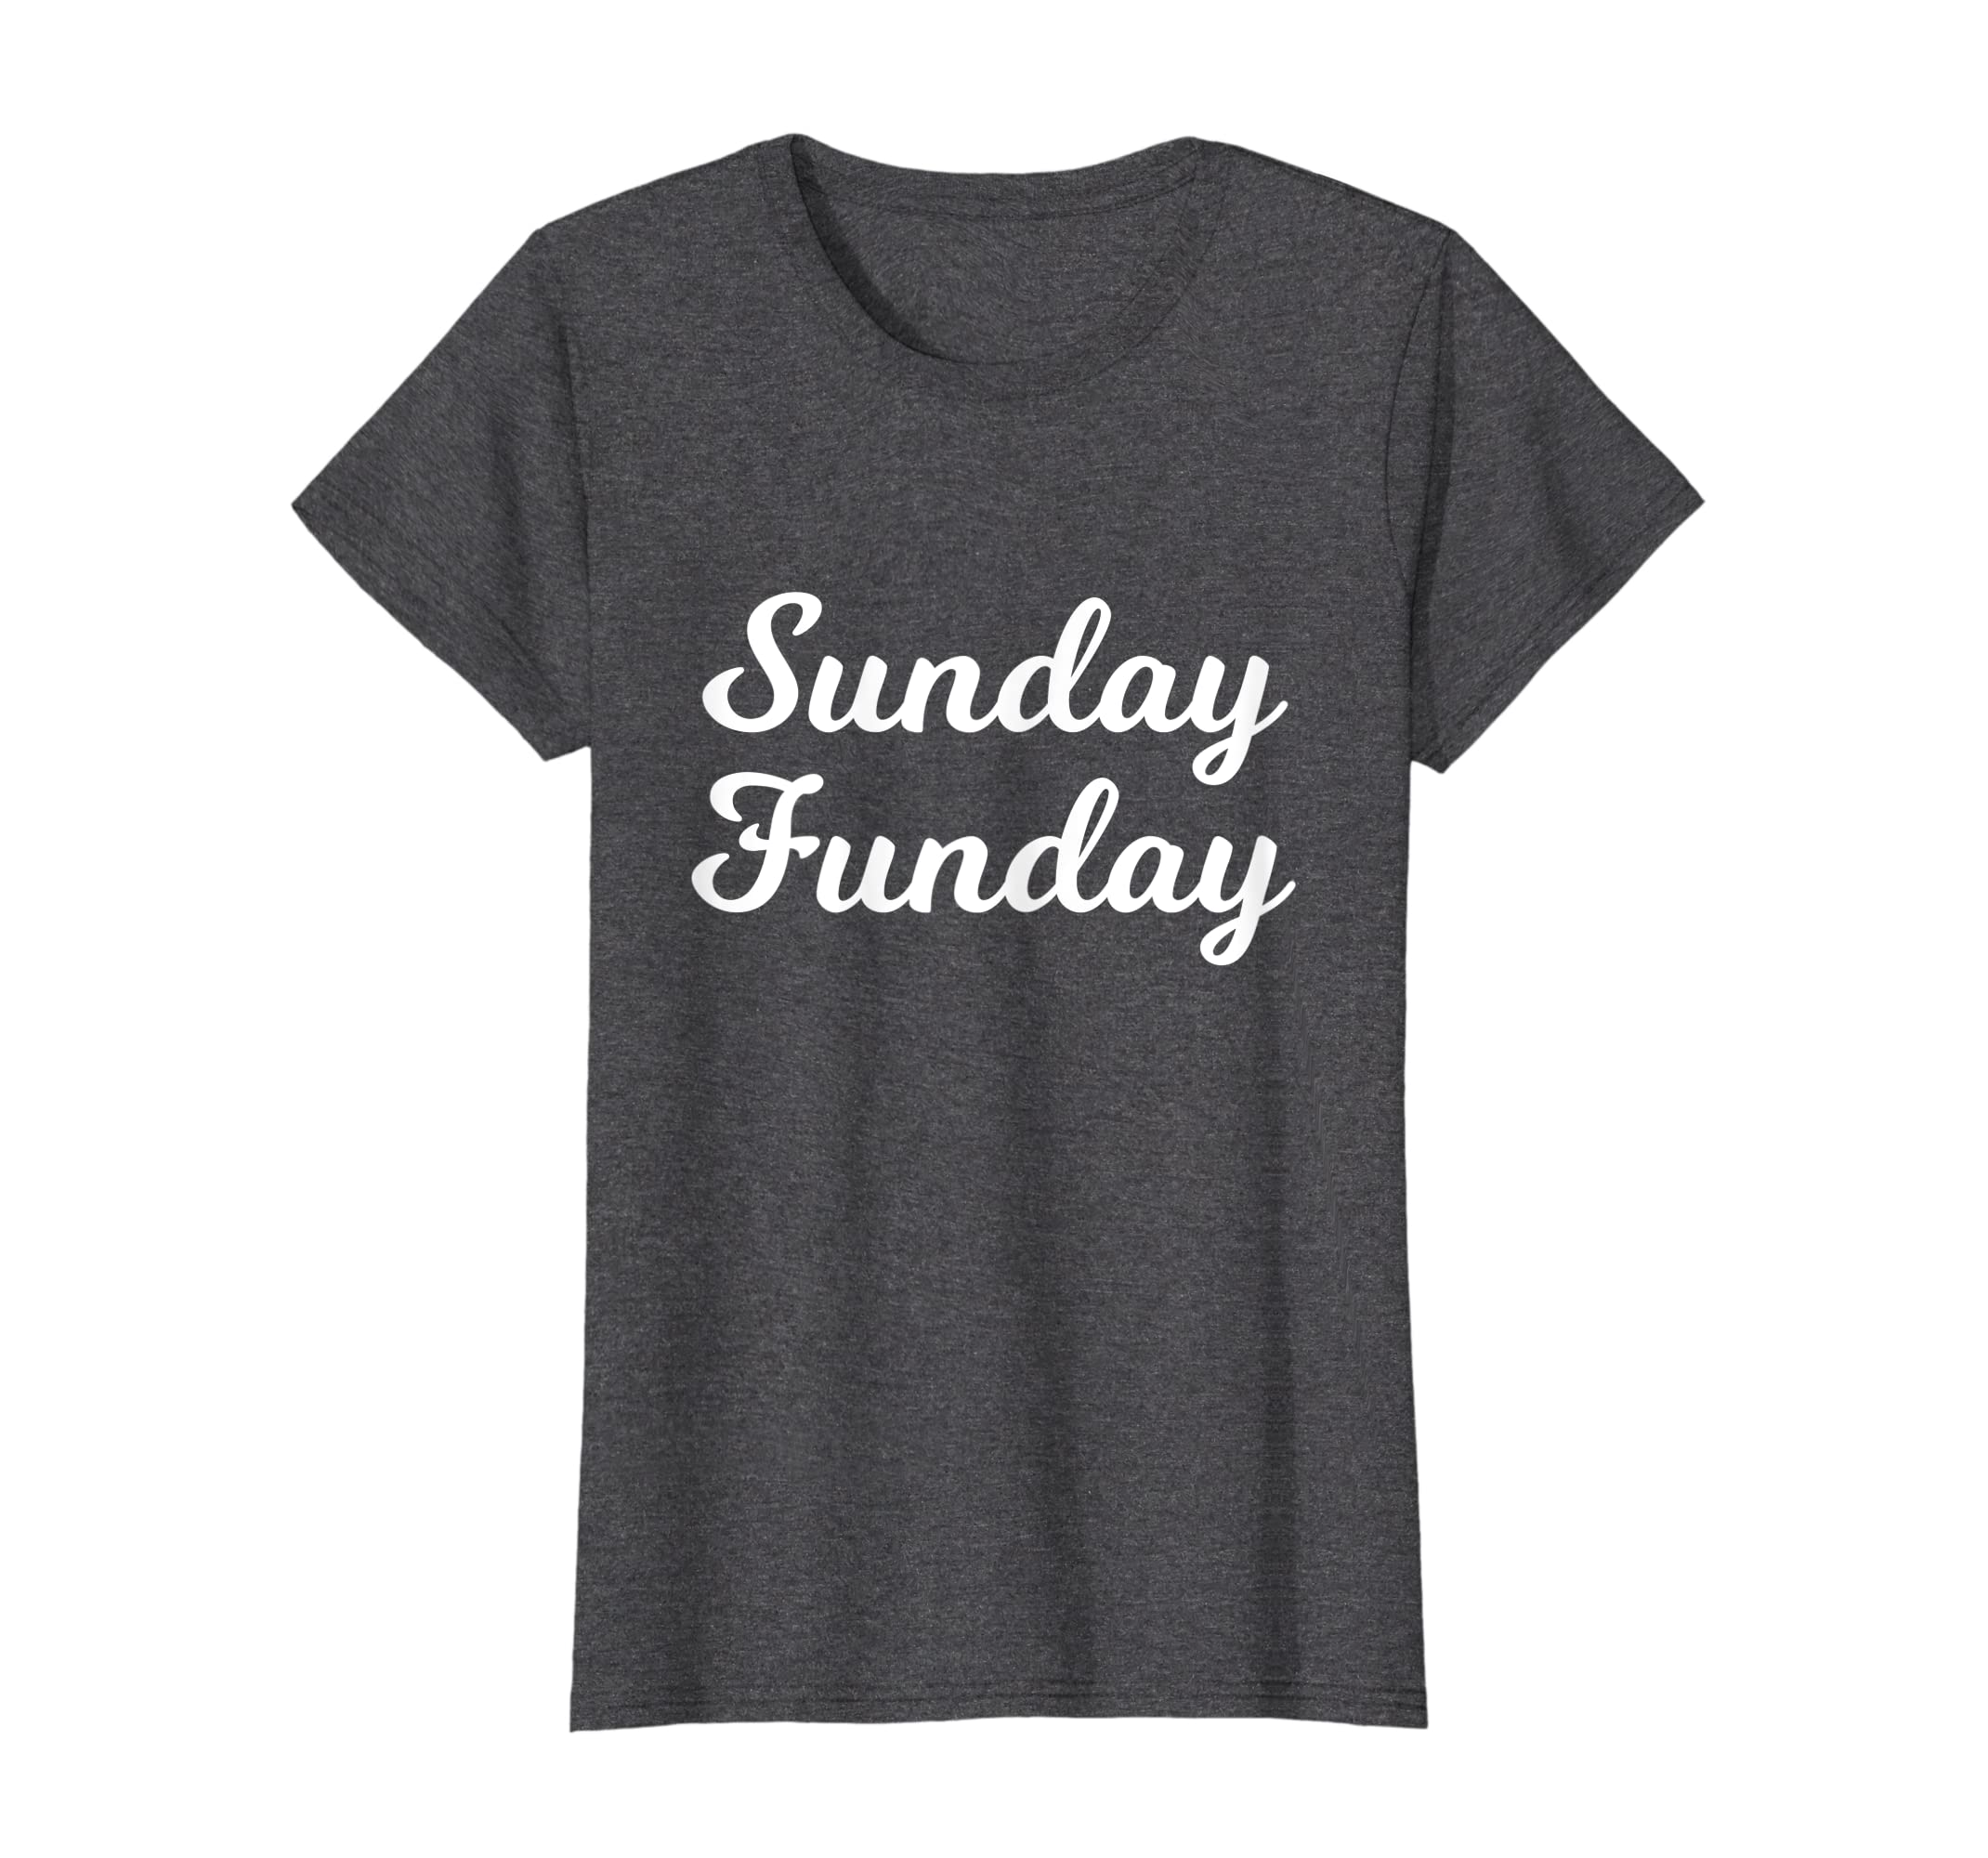 3935a4a2a23c Amazon.com  Sunday Funday - Womens Football T-Shirt